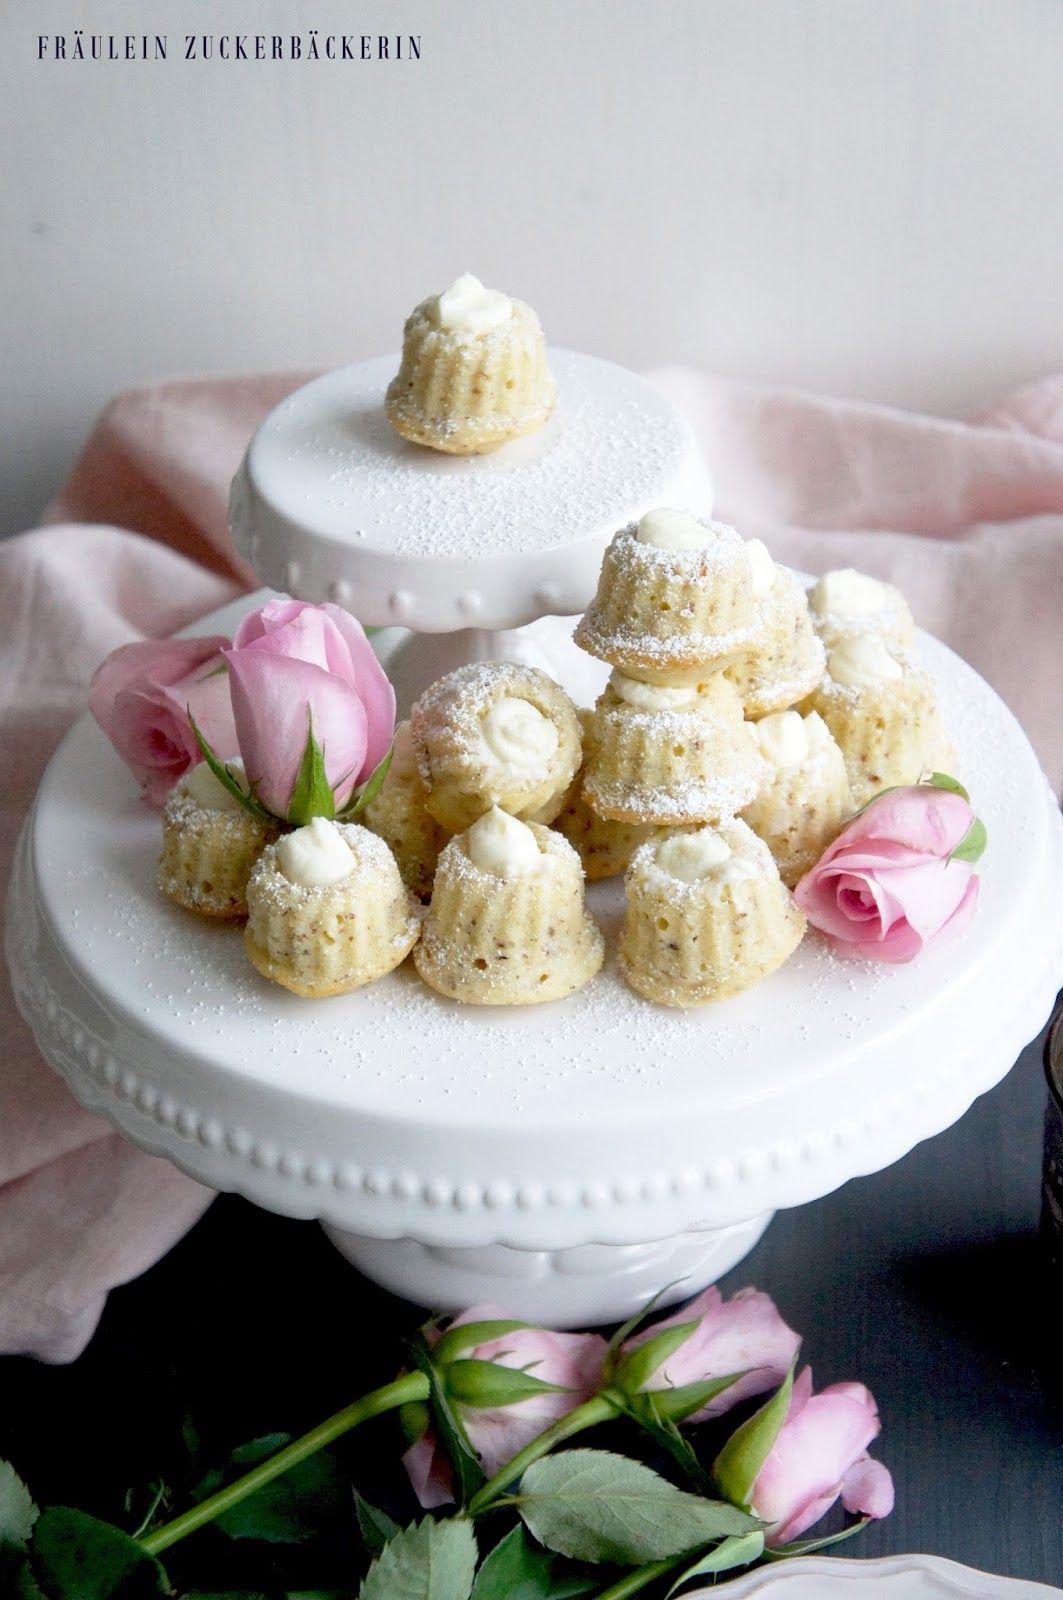 Valentinstag, Backen Für Den Liebsten, Mandelkuchen, Gugelhupf, Mini Gugel,  Mini Gugelhupf